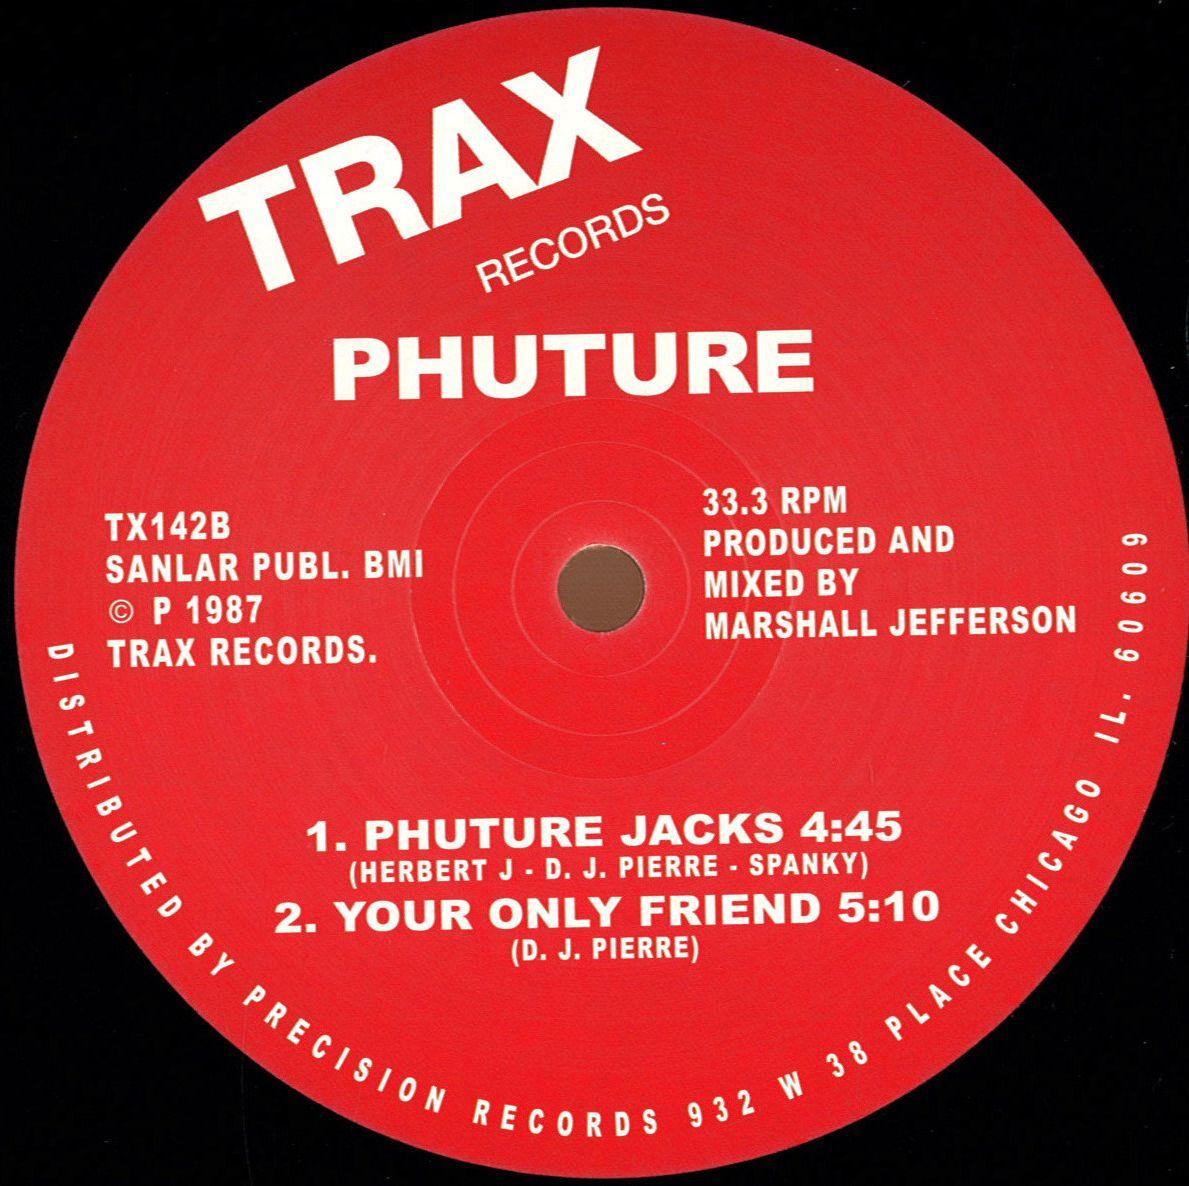 Phuture acid tracks trax records vinyl record for Acid house records